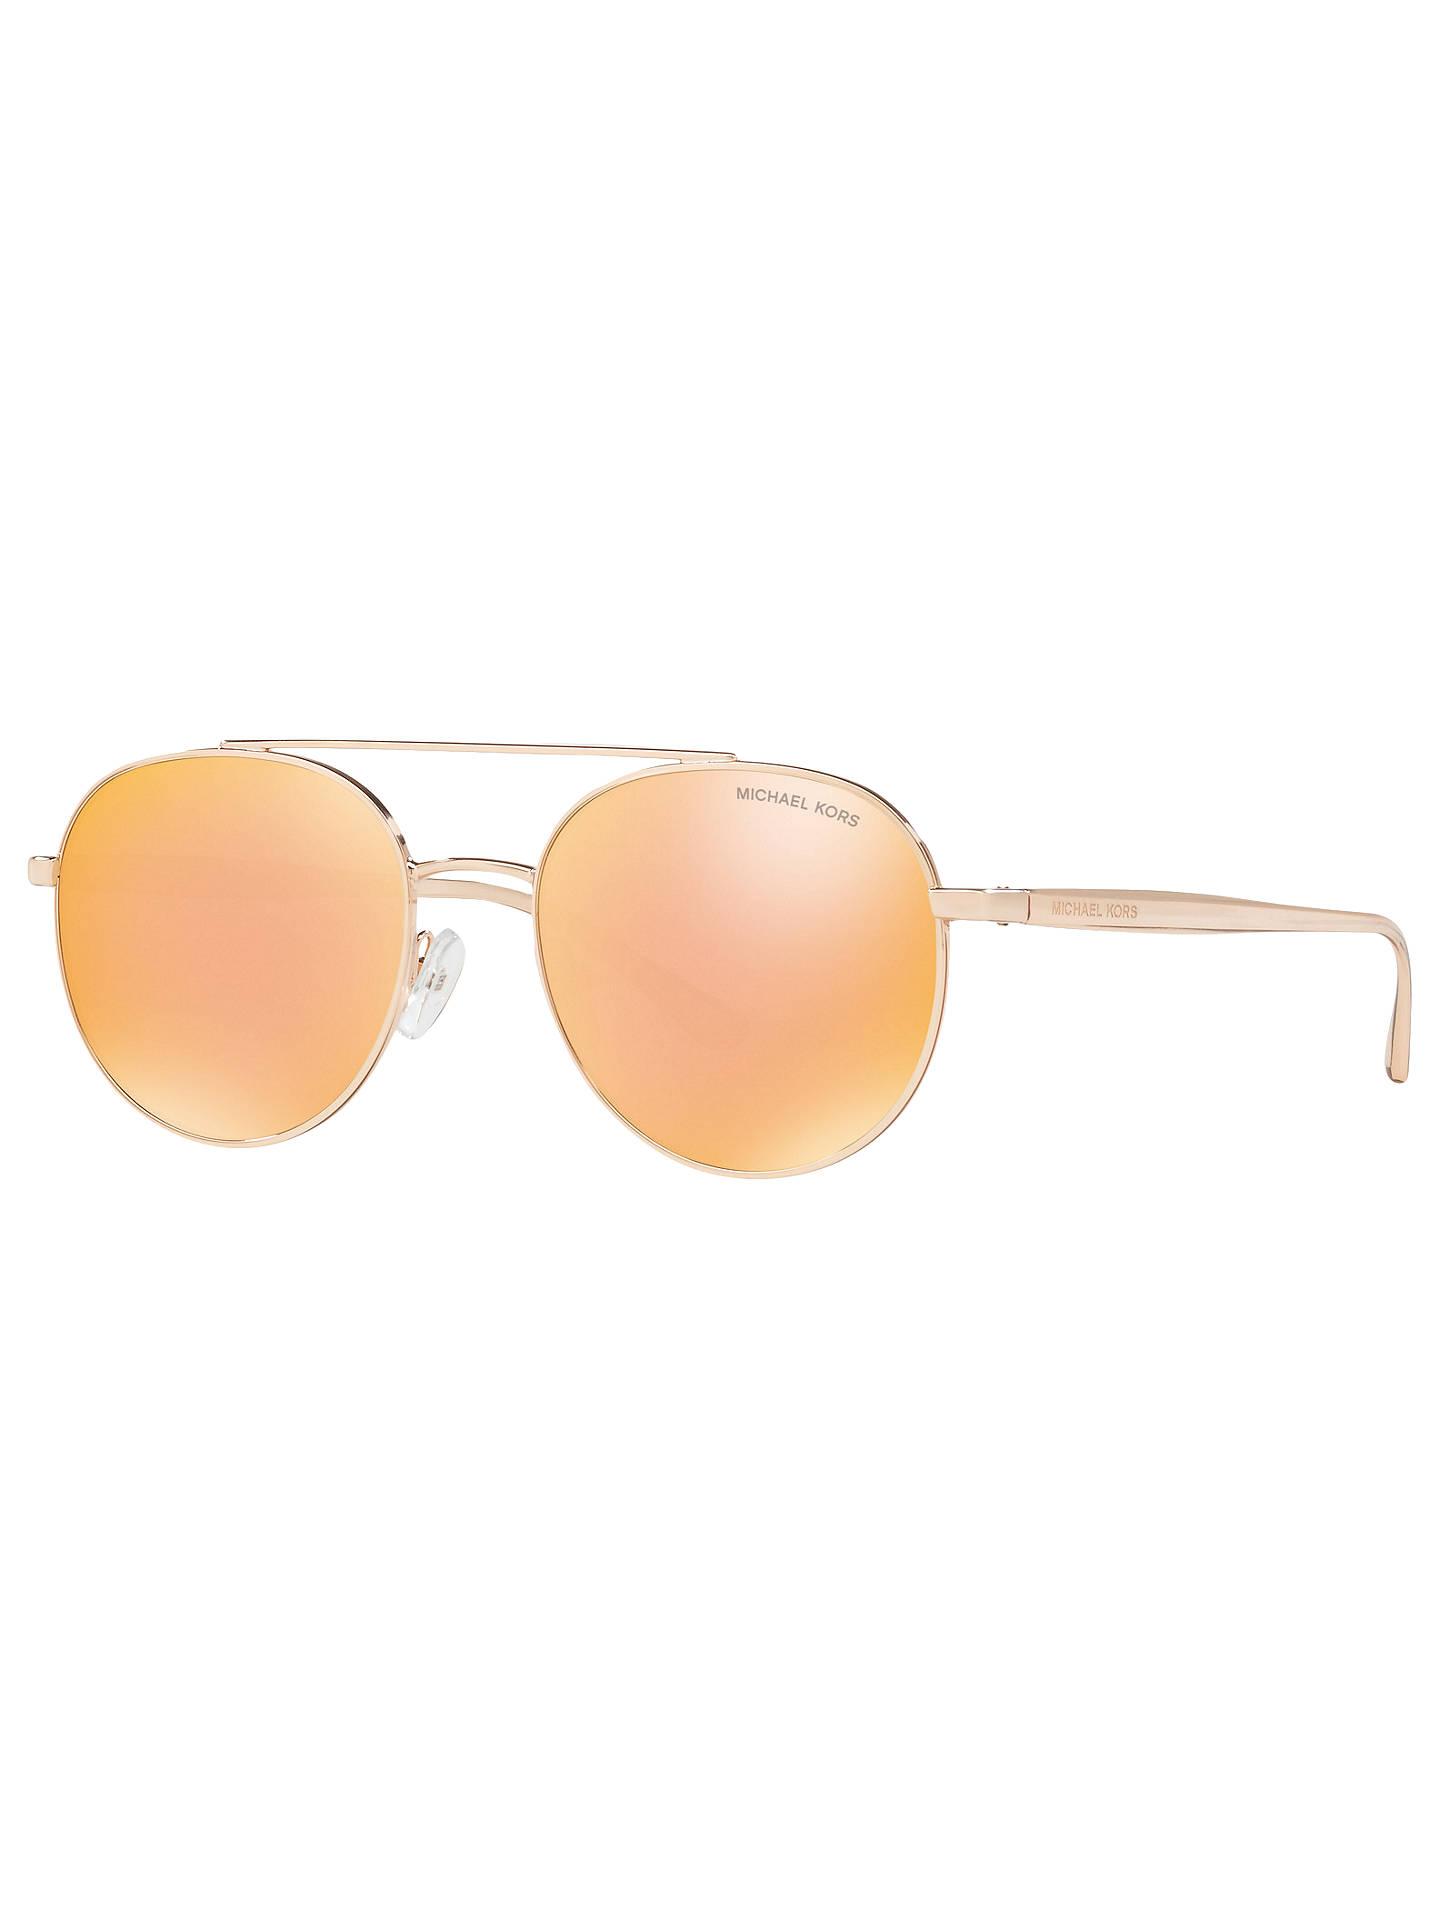 0835a13d5 Buy Michael Kors MK1021 Lon Round Aviator Sunglasses, Gold/Mirror Orange  Online at johnlewis ...